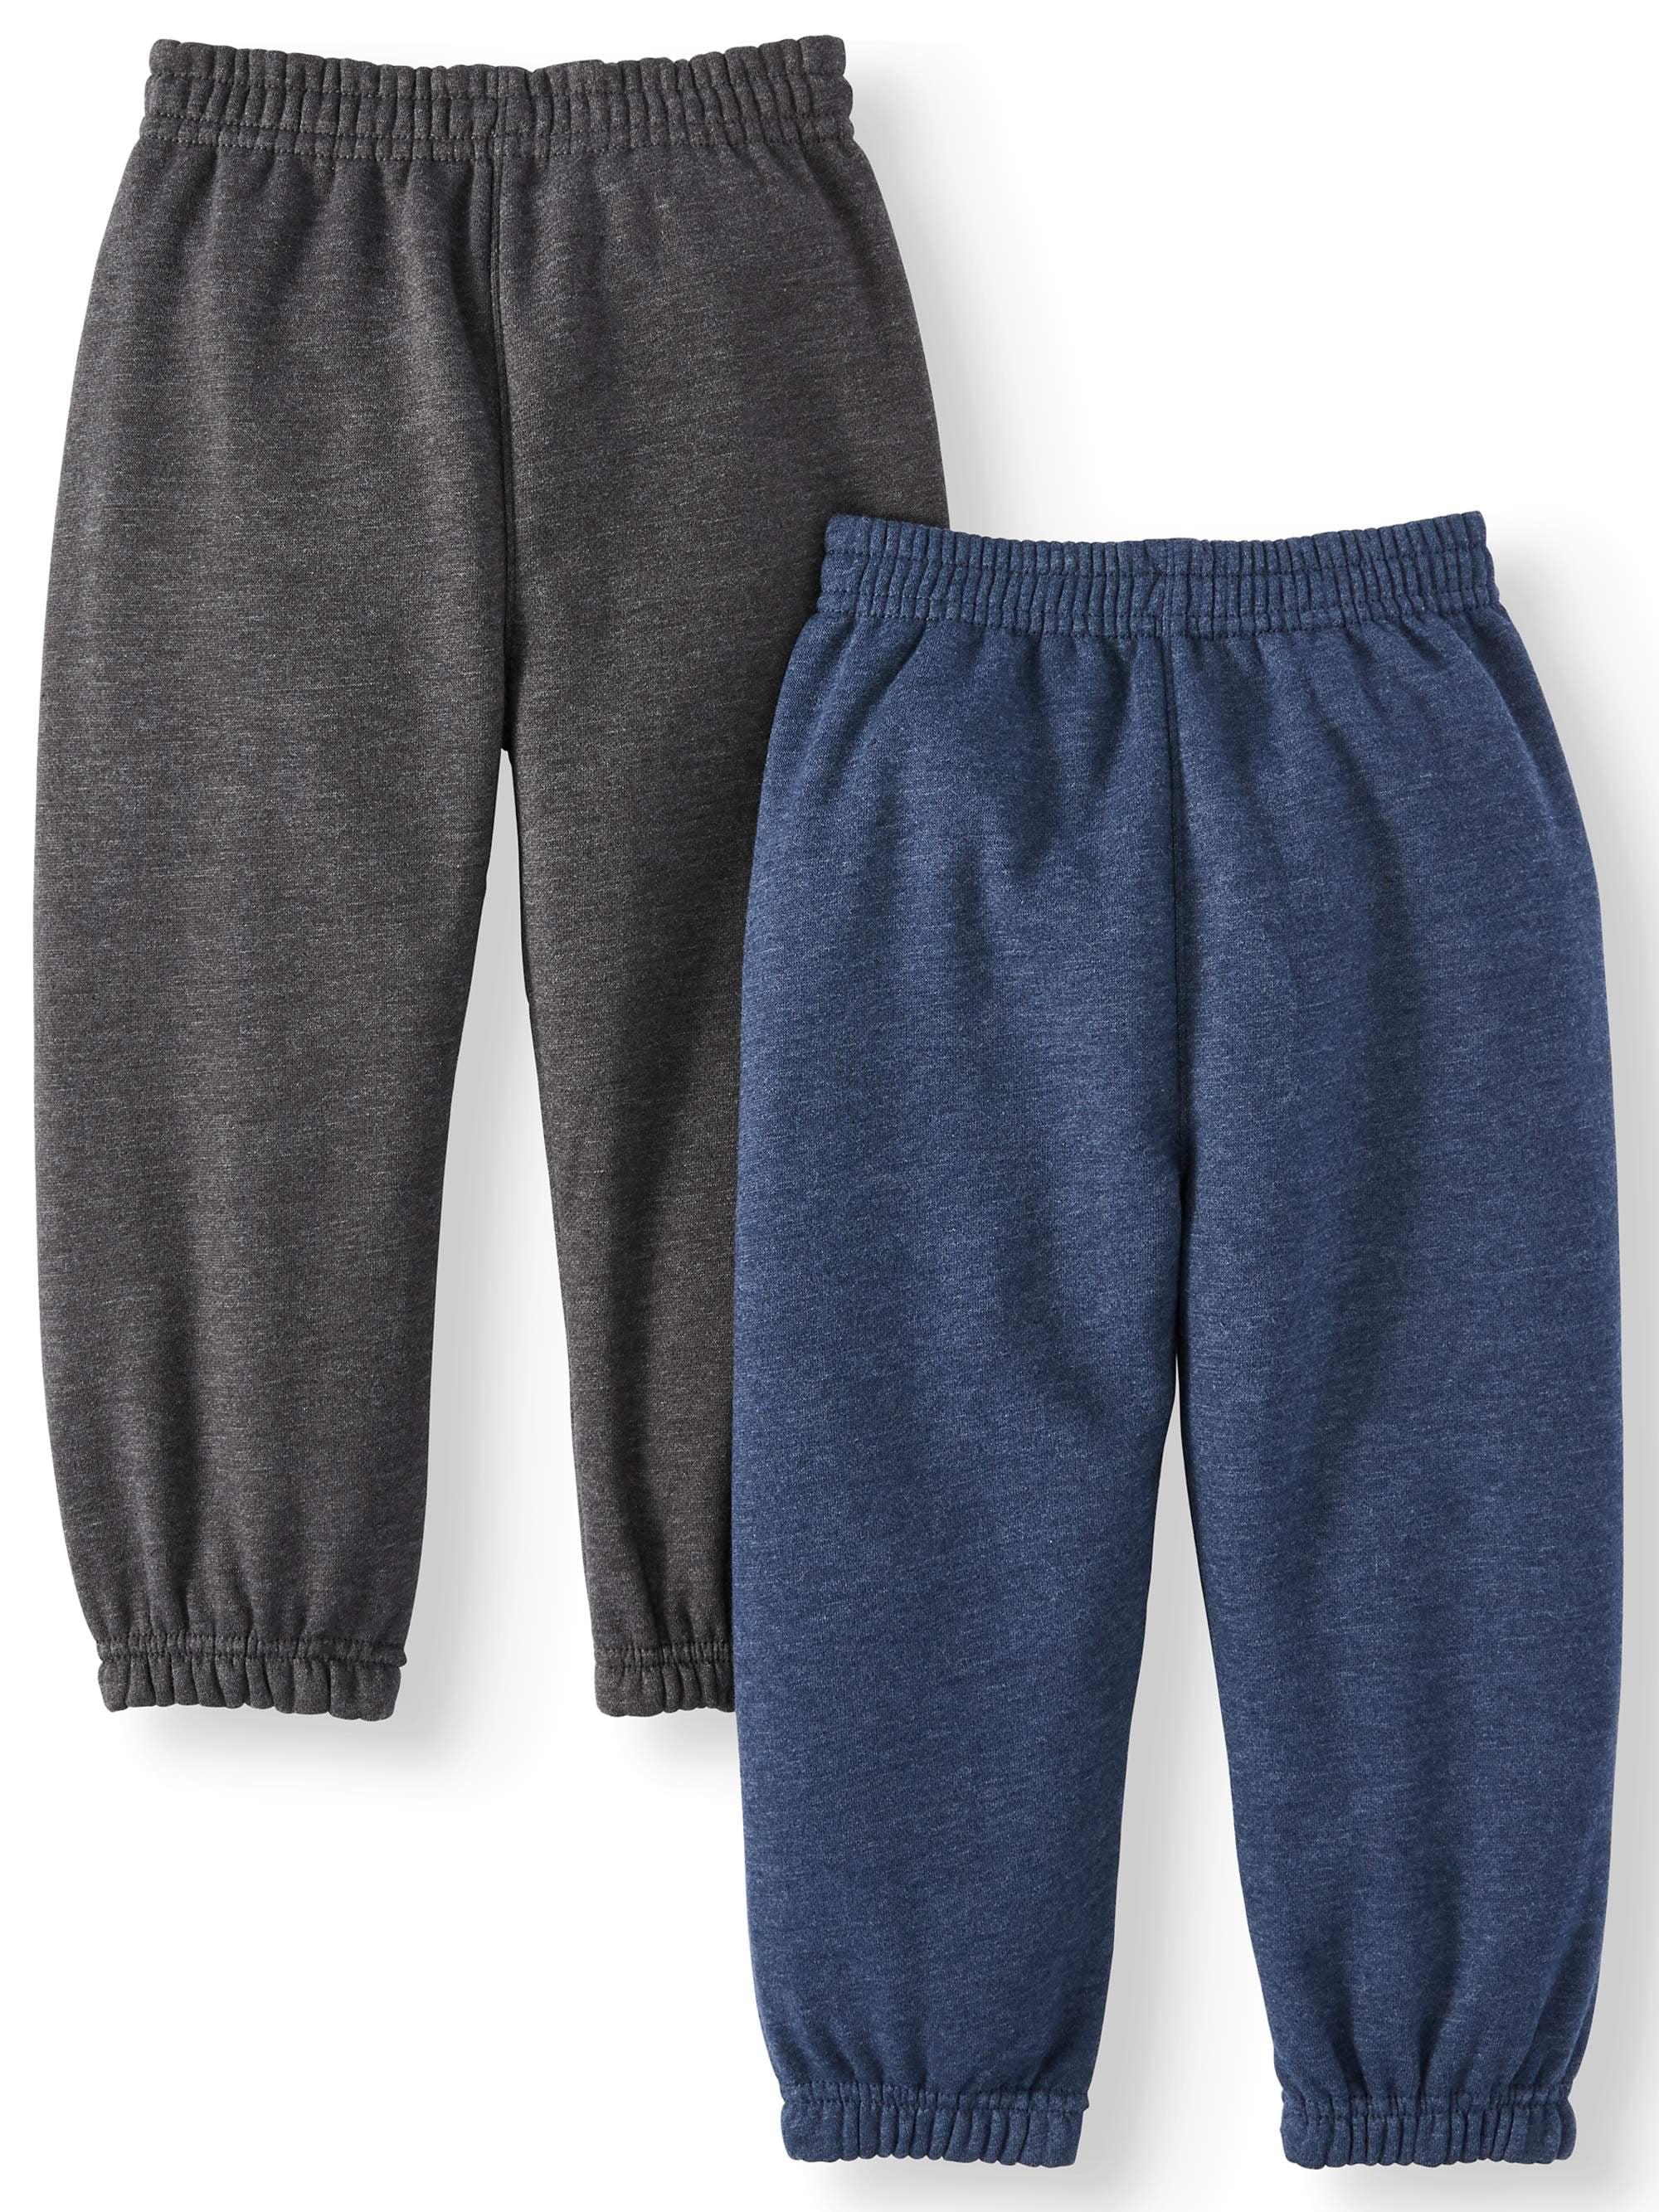 New Garanimals Pants Sz 4T Boys Blue White Stripe Elastic Waist  Cuff  School